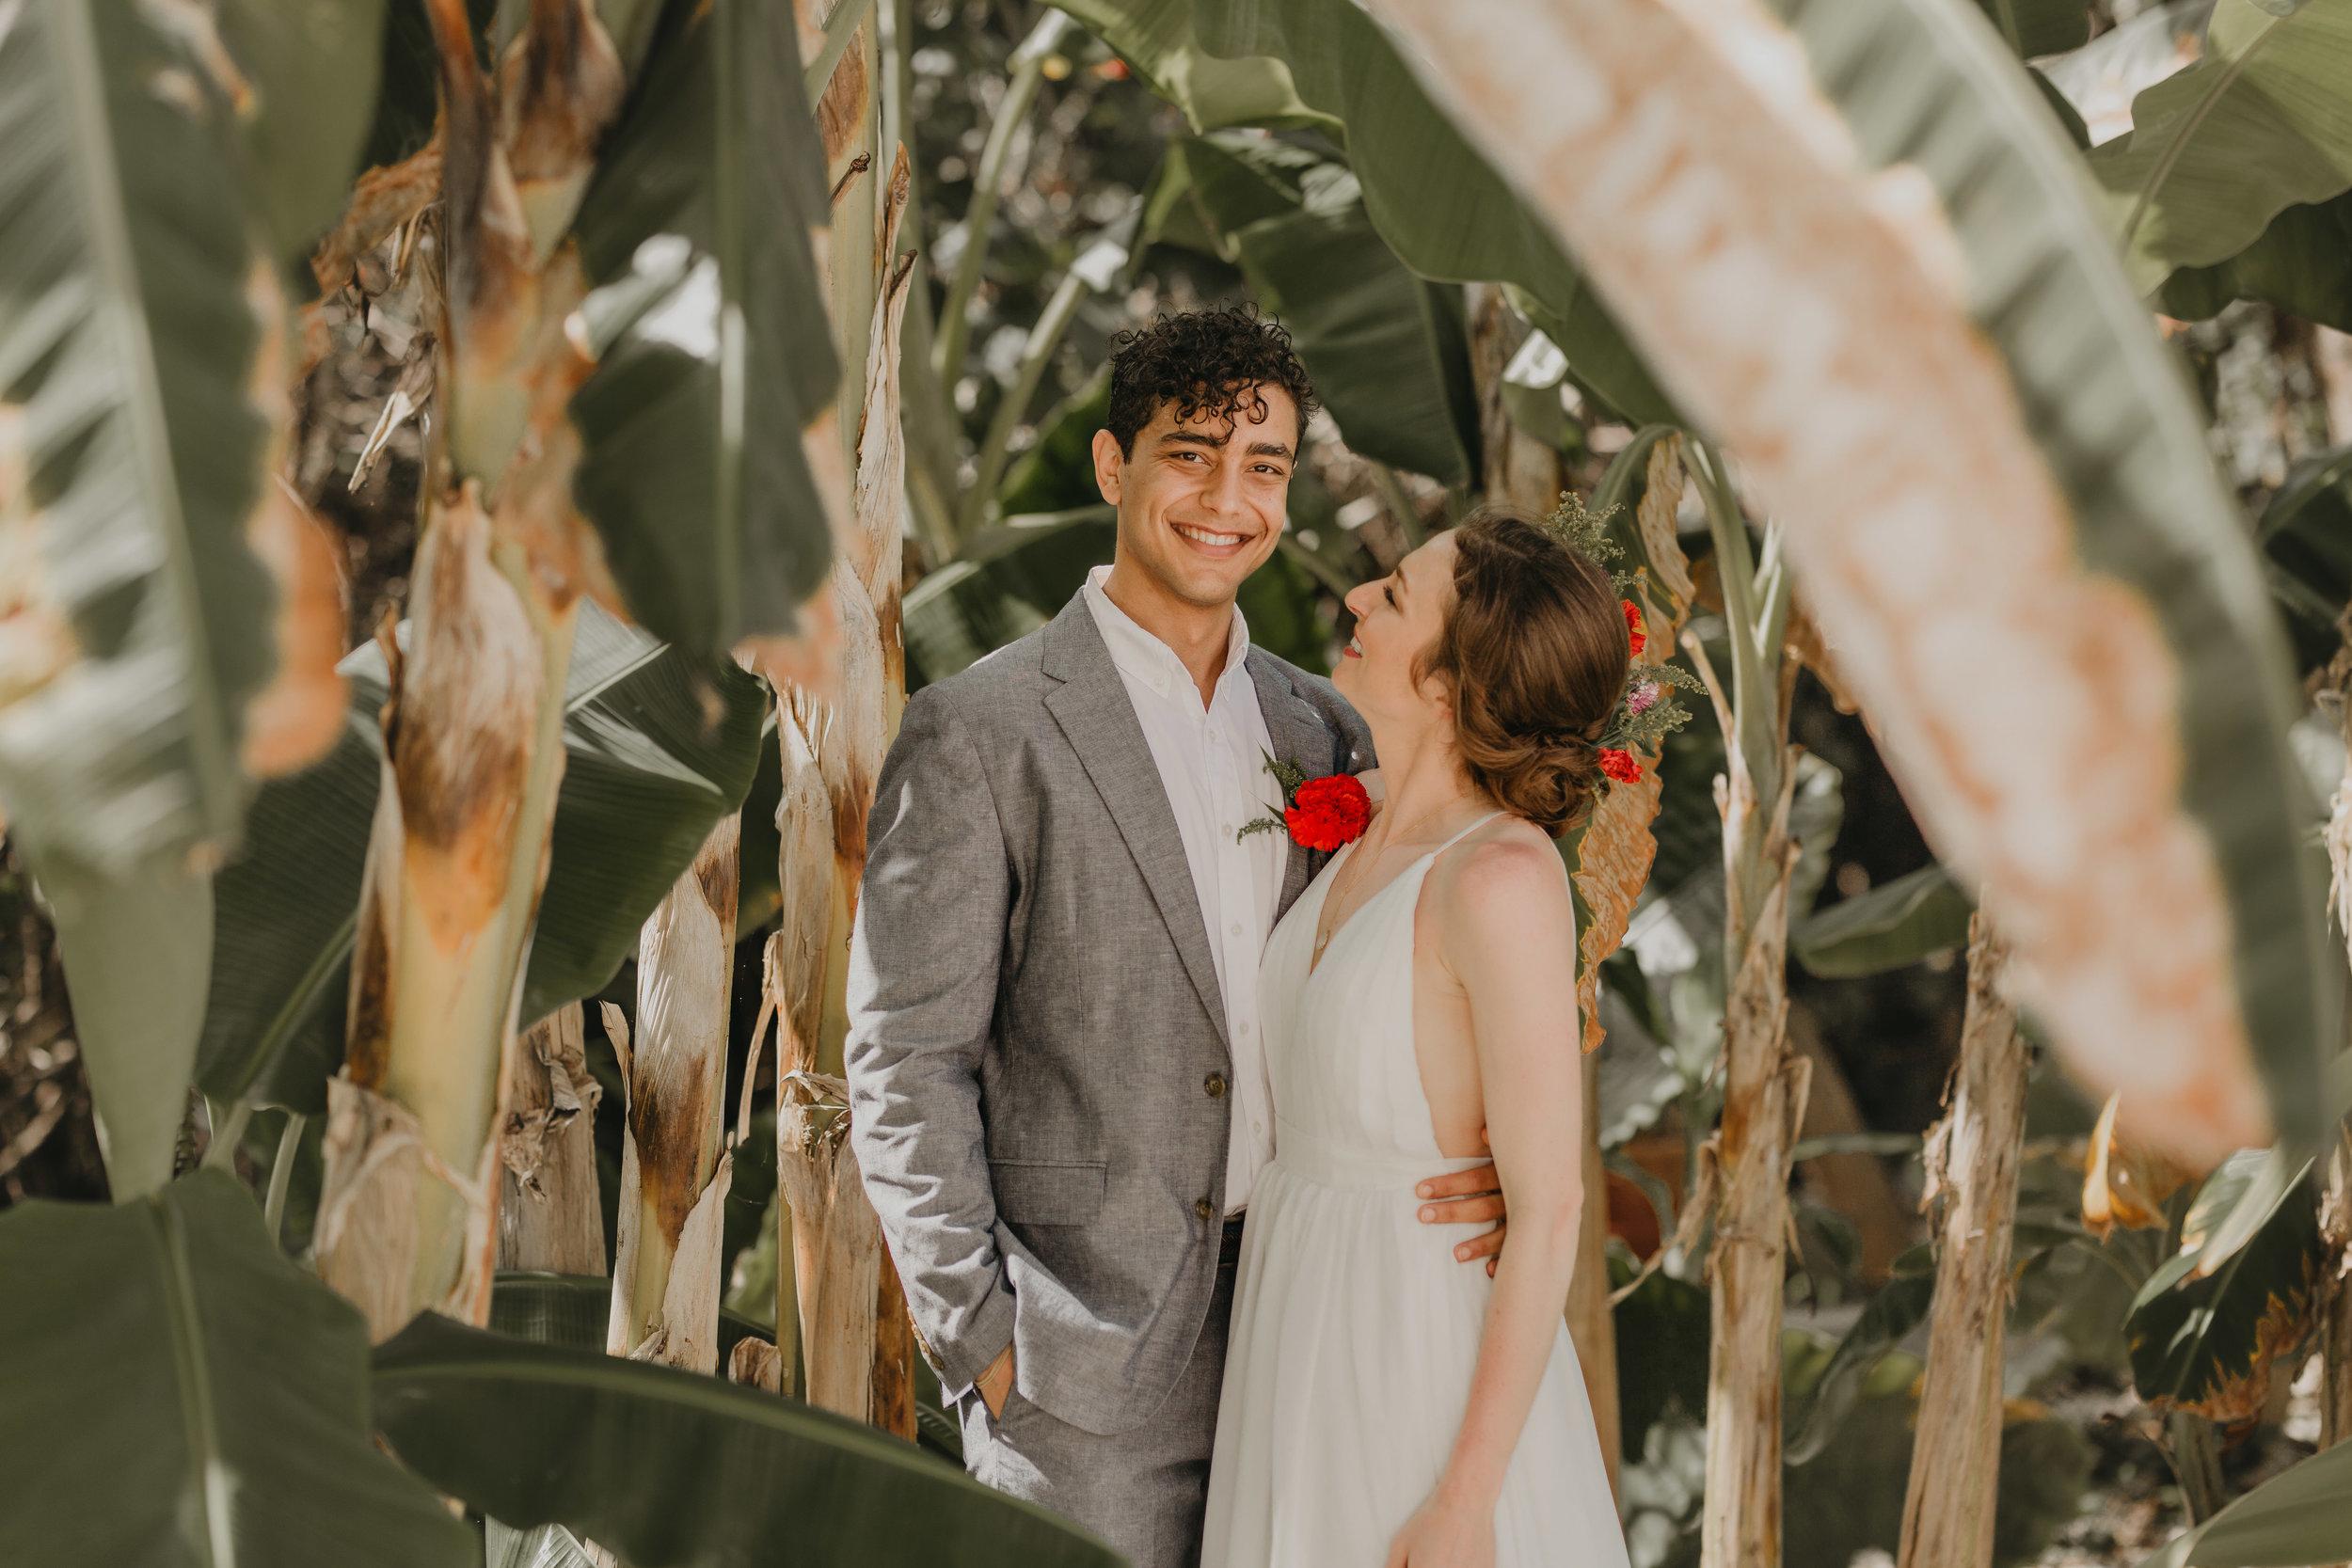 Nicole-Daacke-Photography-beachfront-akumal-destionation-wedding-tulum-mexico-elopement-photographer-destination-wedding-inspiration-sunset-champagne-pop-boho-bride-ocean-tropical-bohemian-tulum-wedding-photos-110.jpg